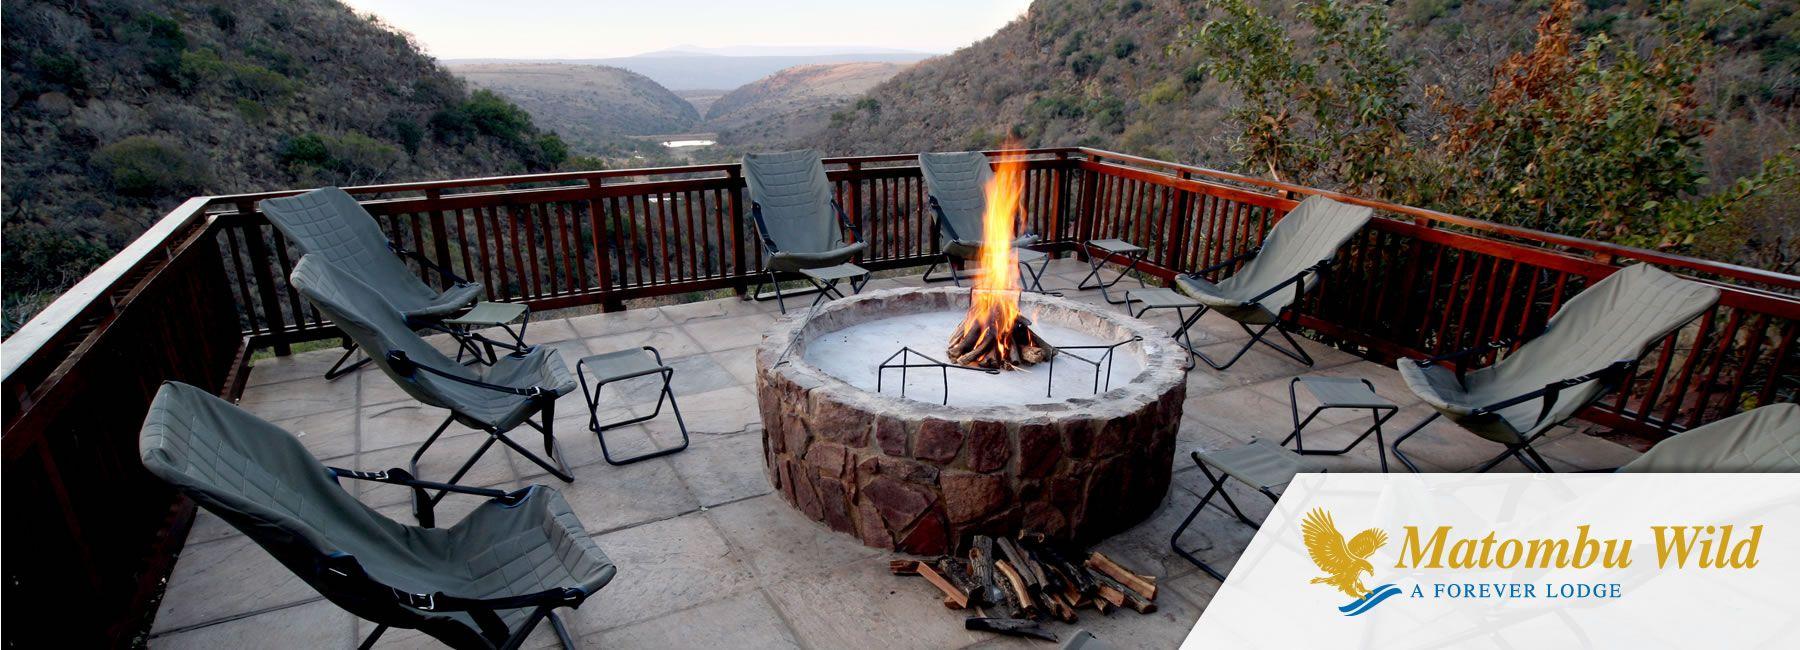 Matombu Wild, A Forever Lodge